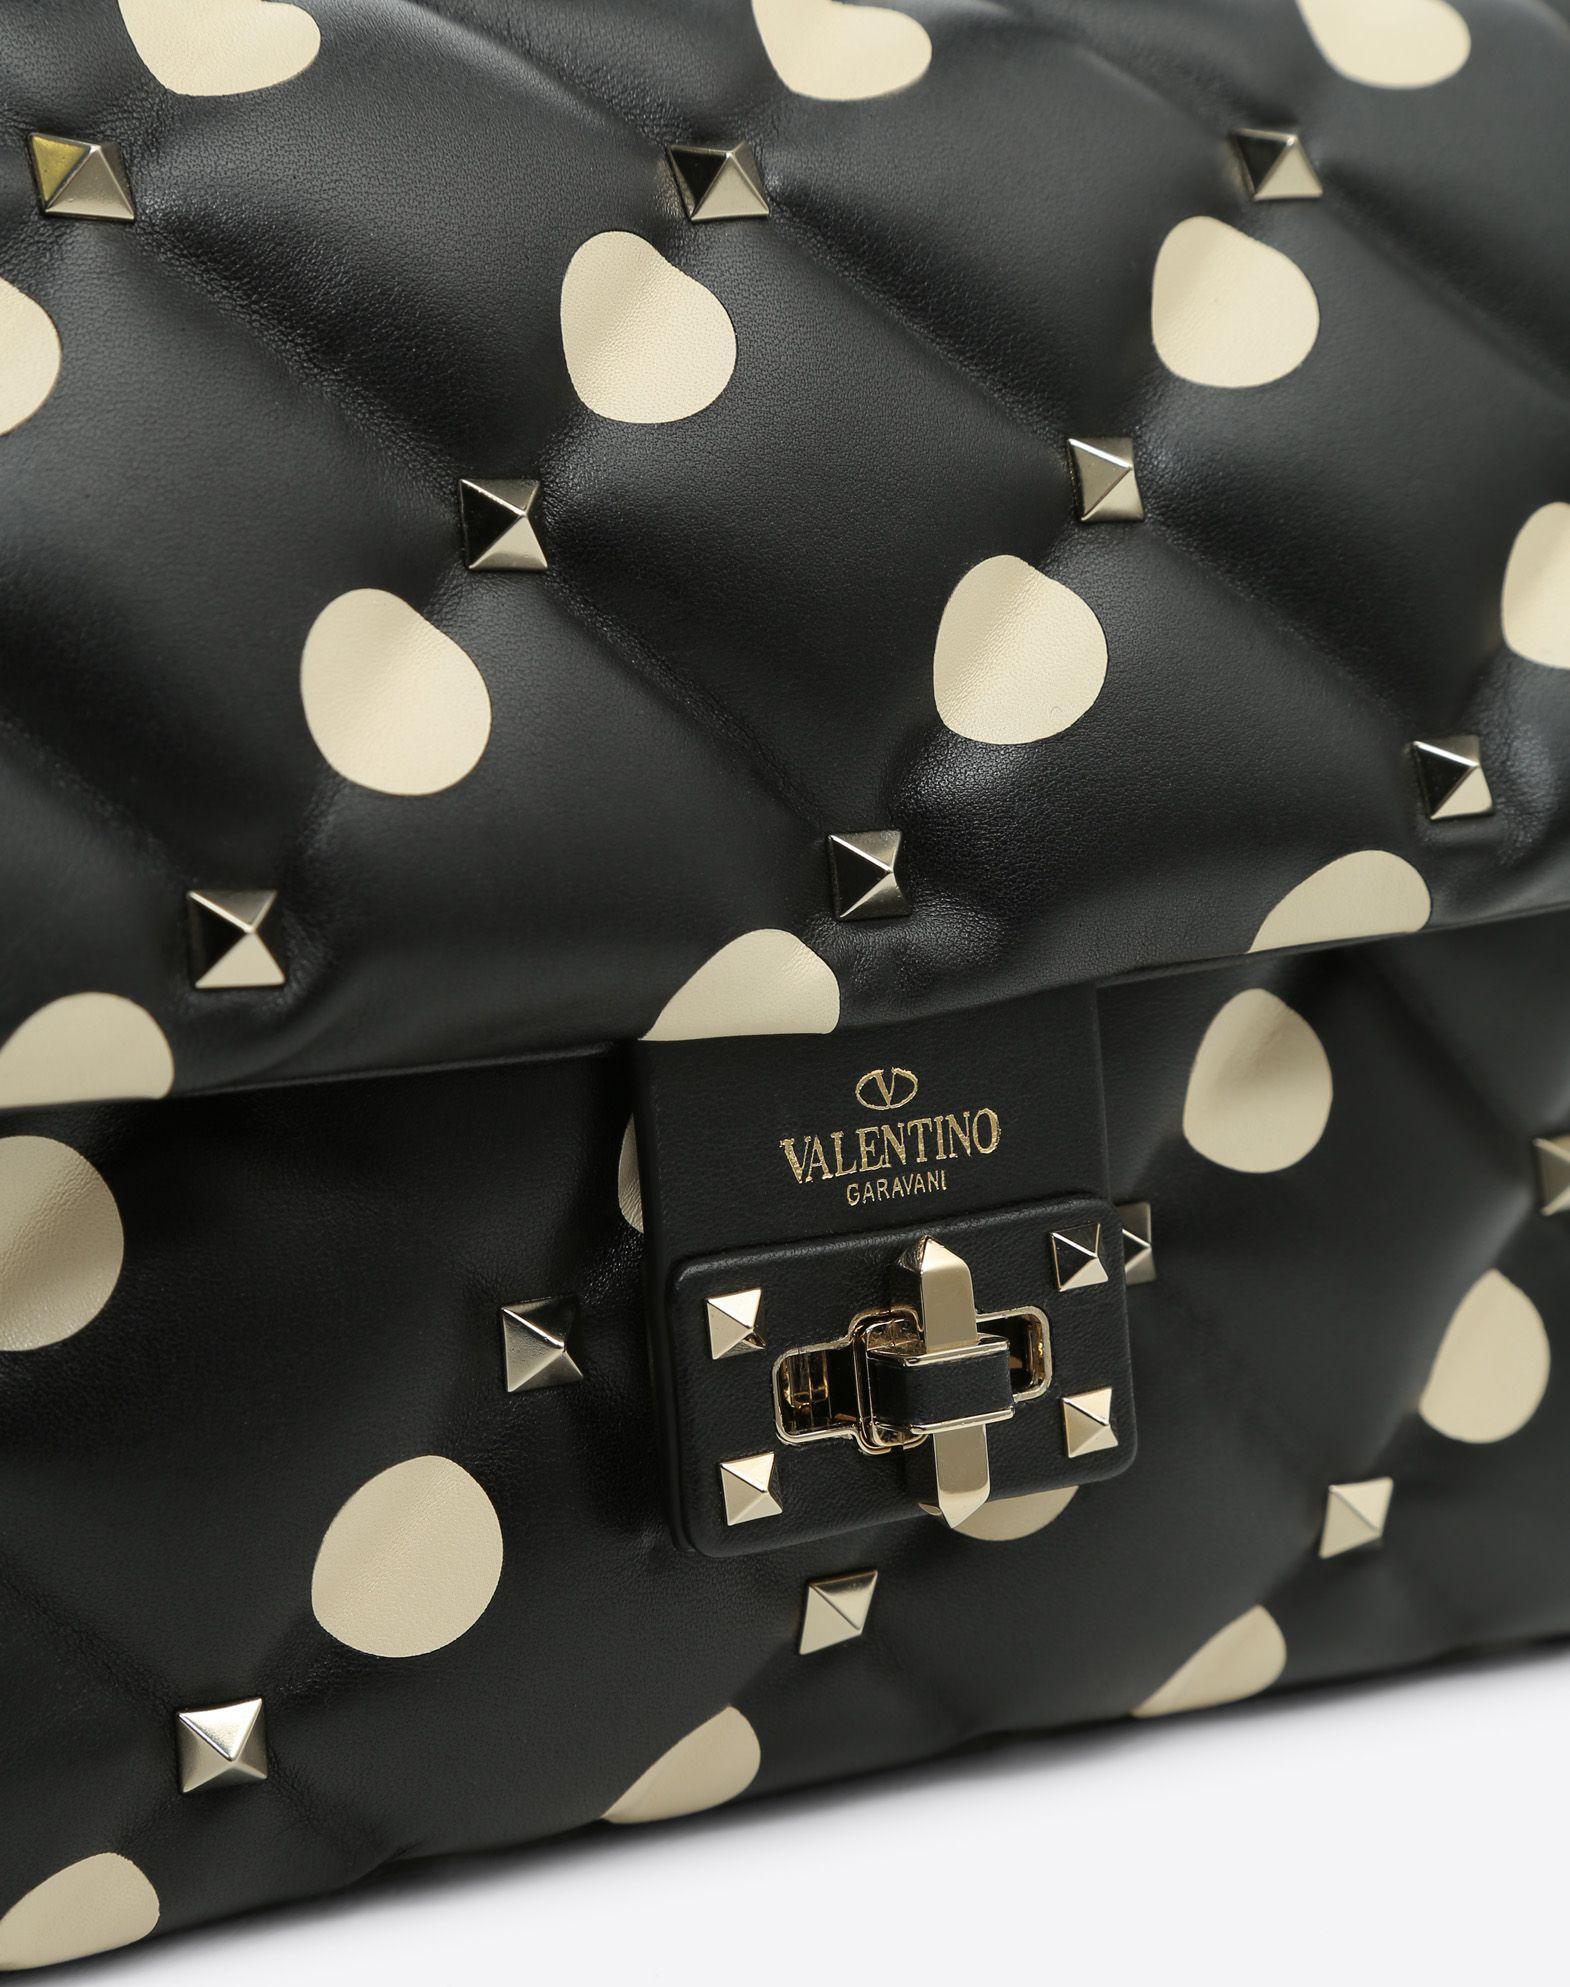 VALENTINO GARAVANI Candystud Top Handle Bag HANDBAG D b